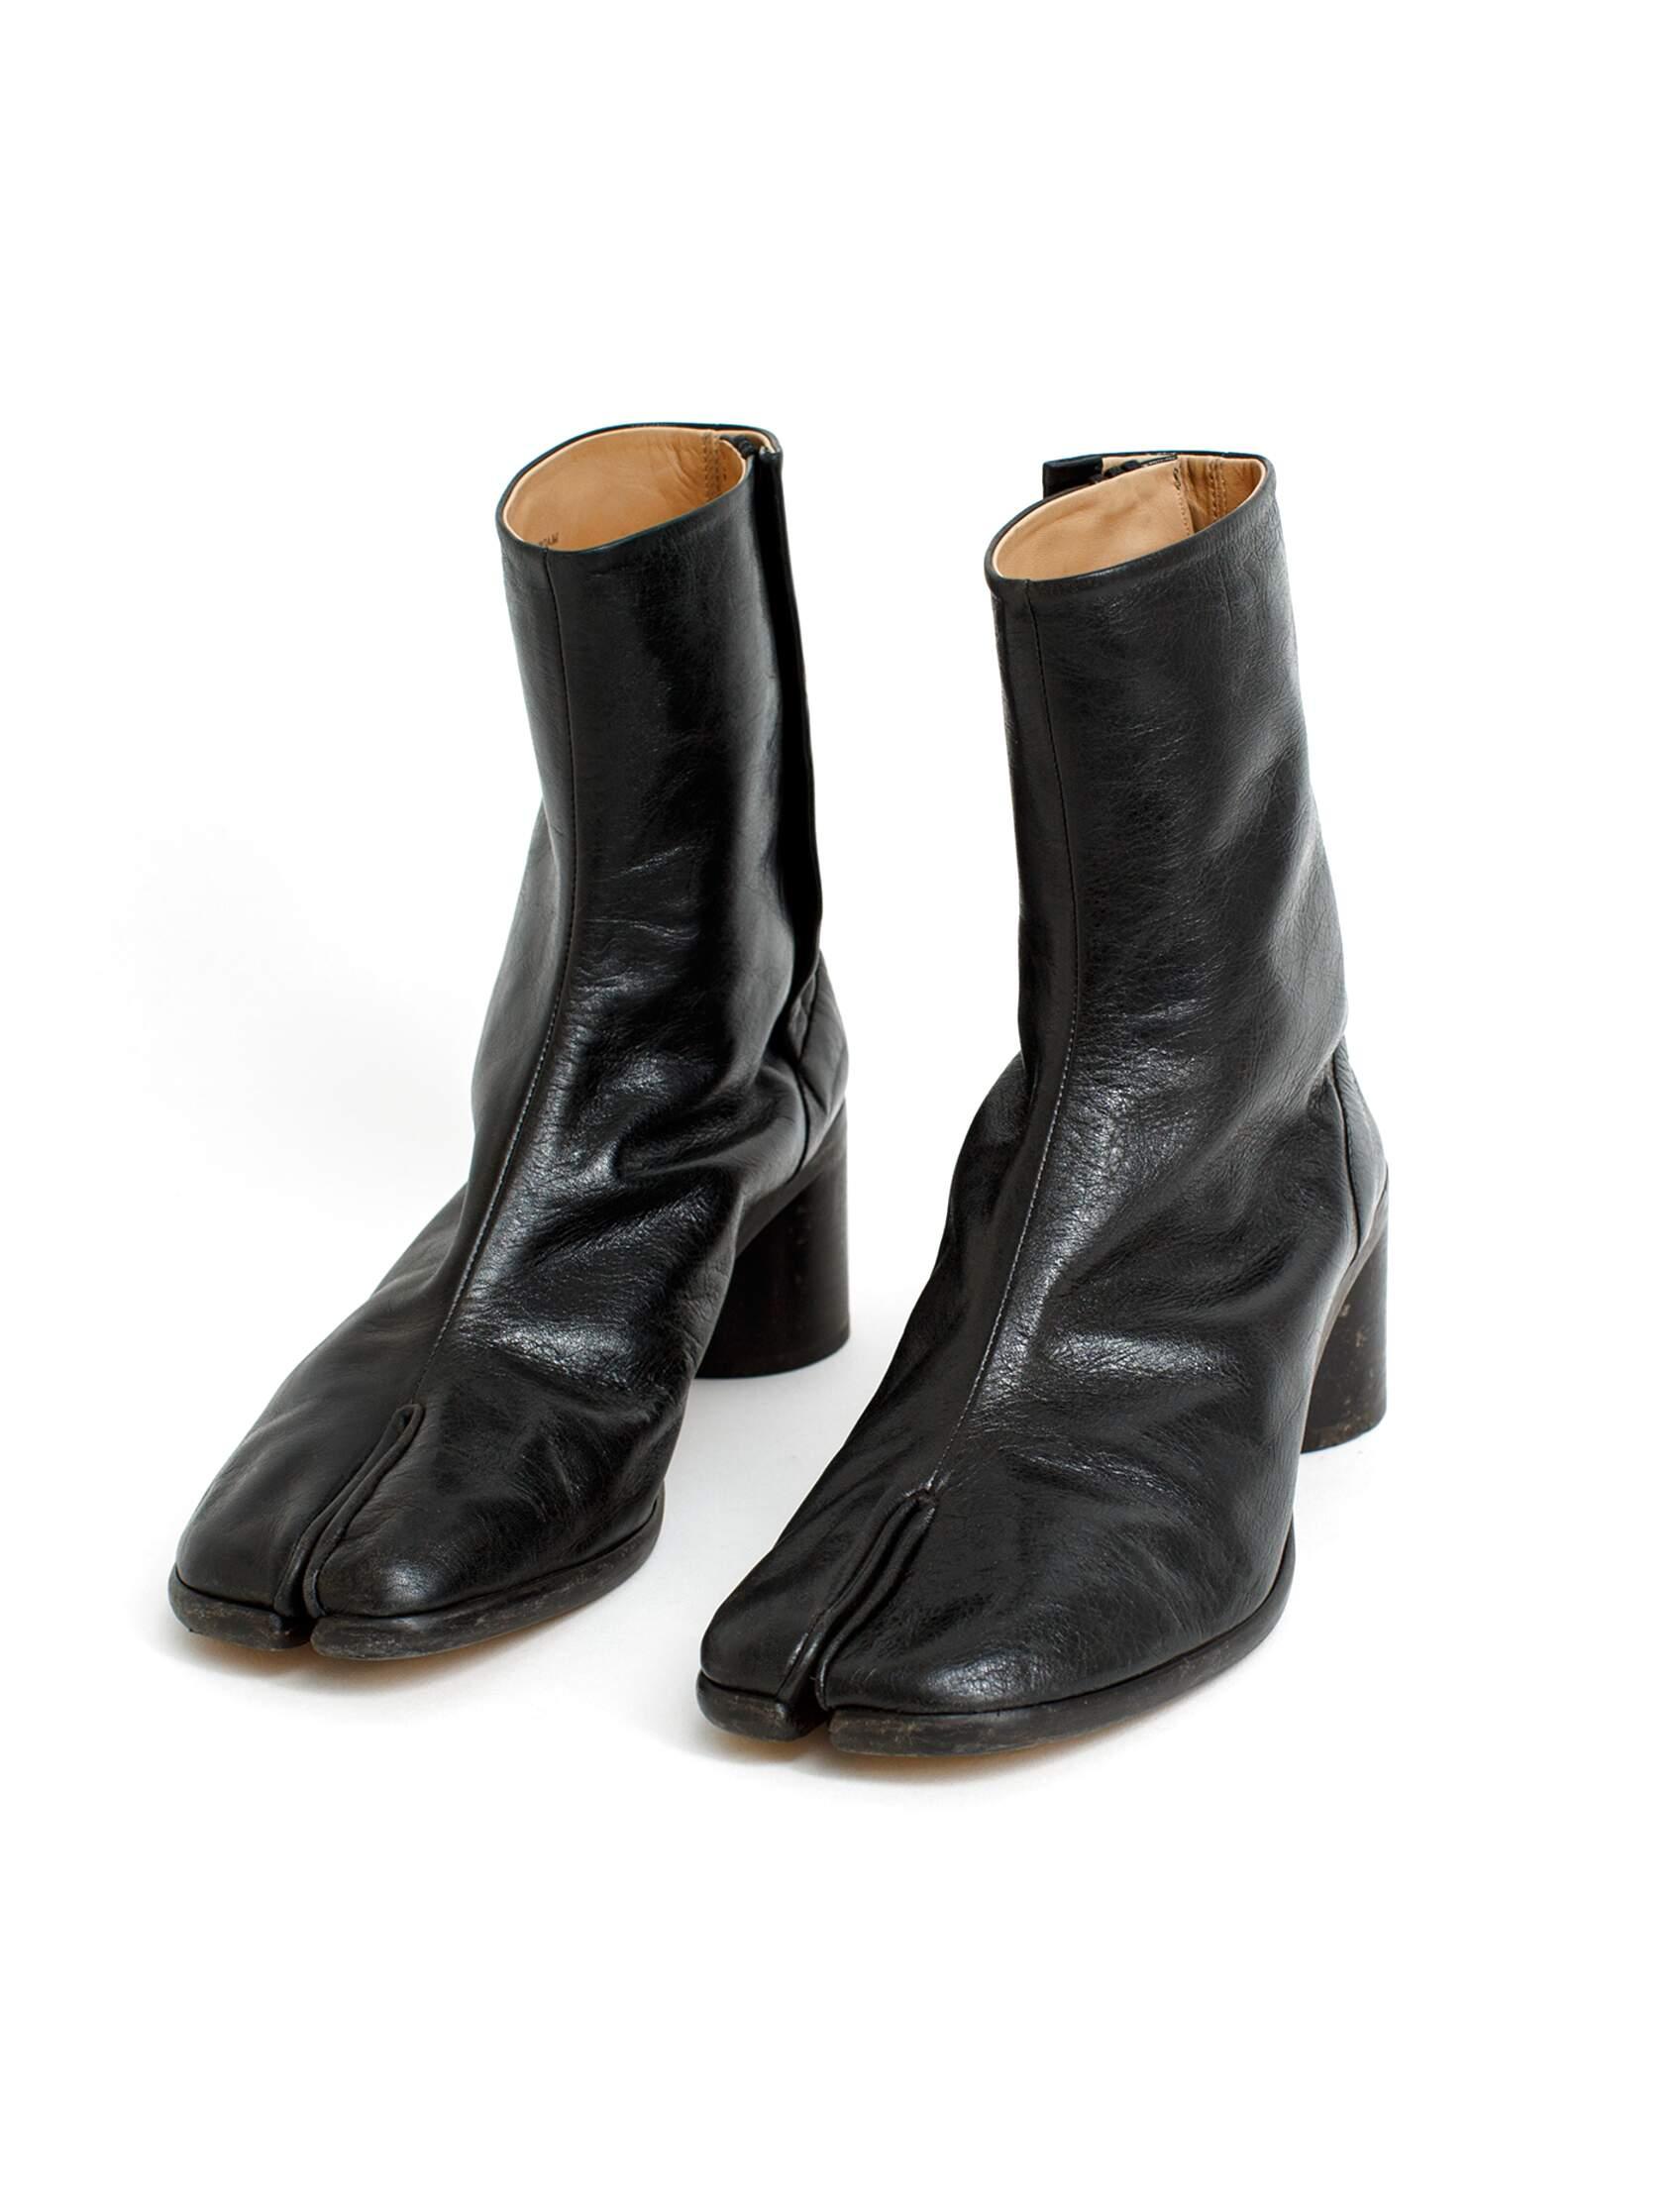 margiela tabi boots for sale